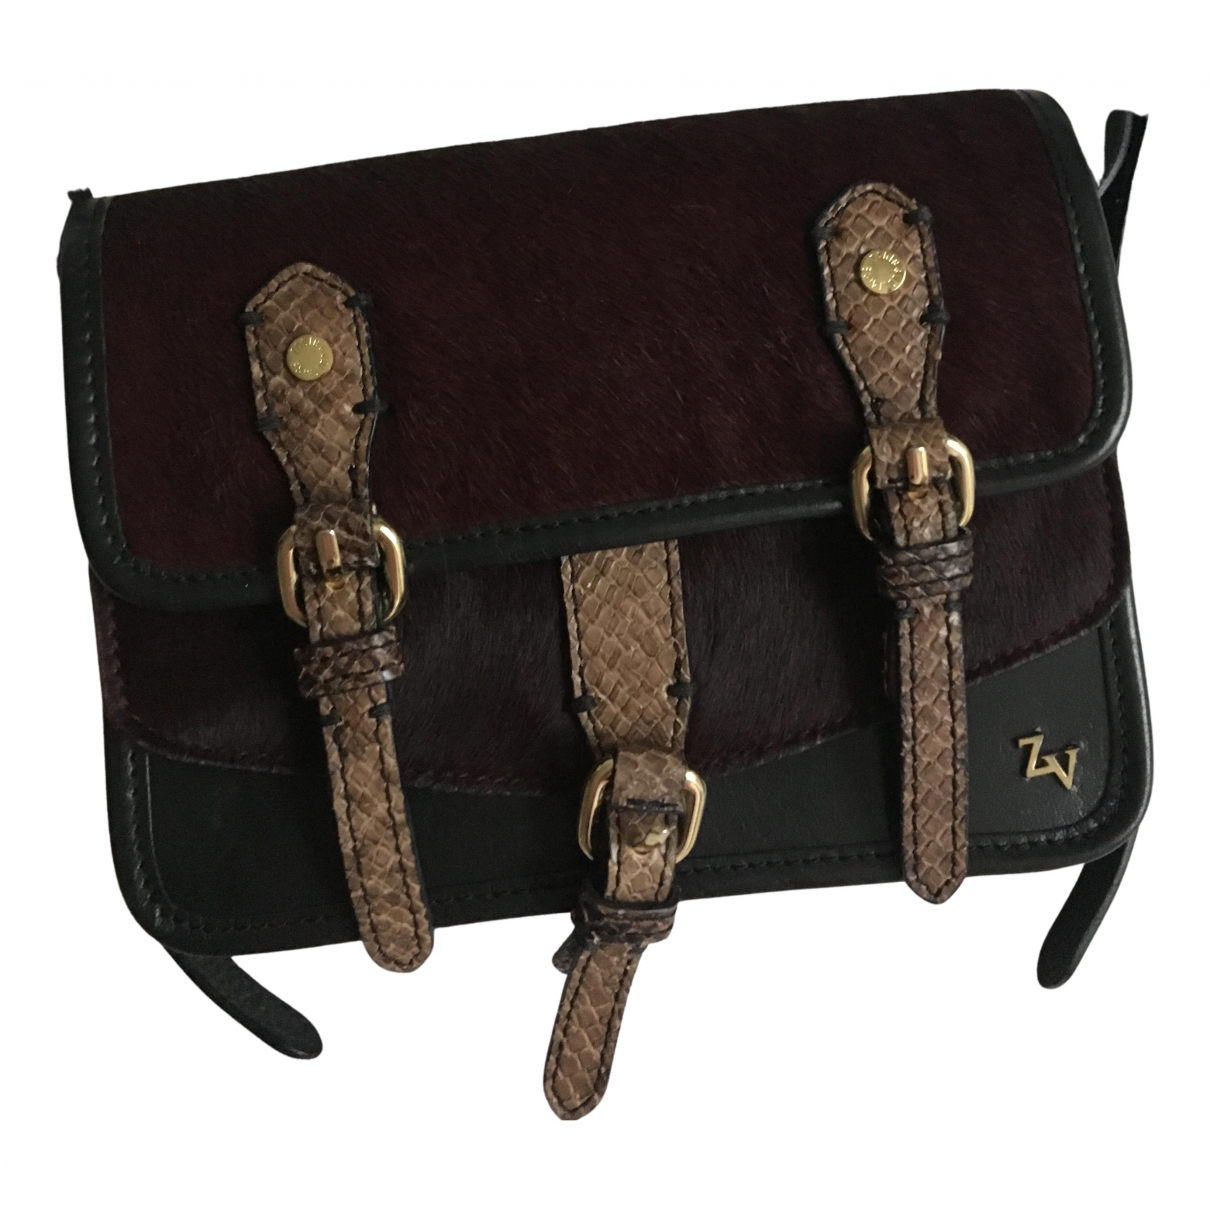 Zadig & Voltaire N Black Leather handbag for Women N